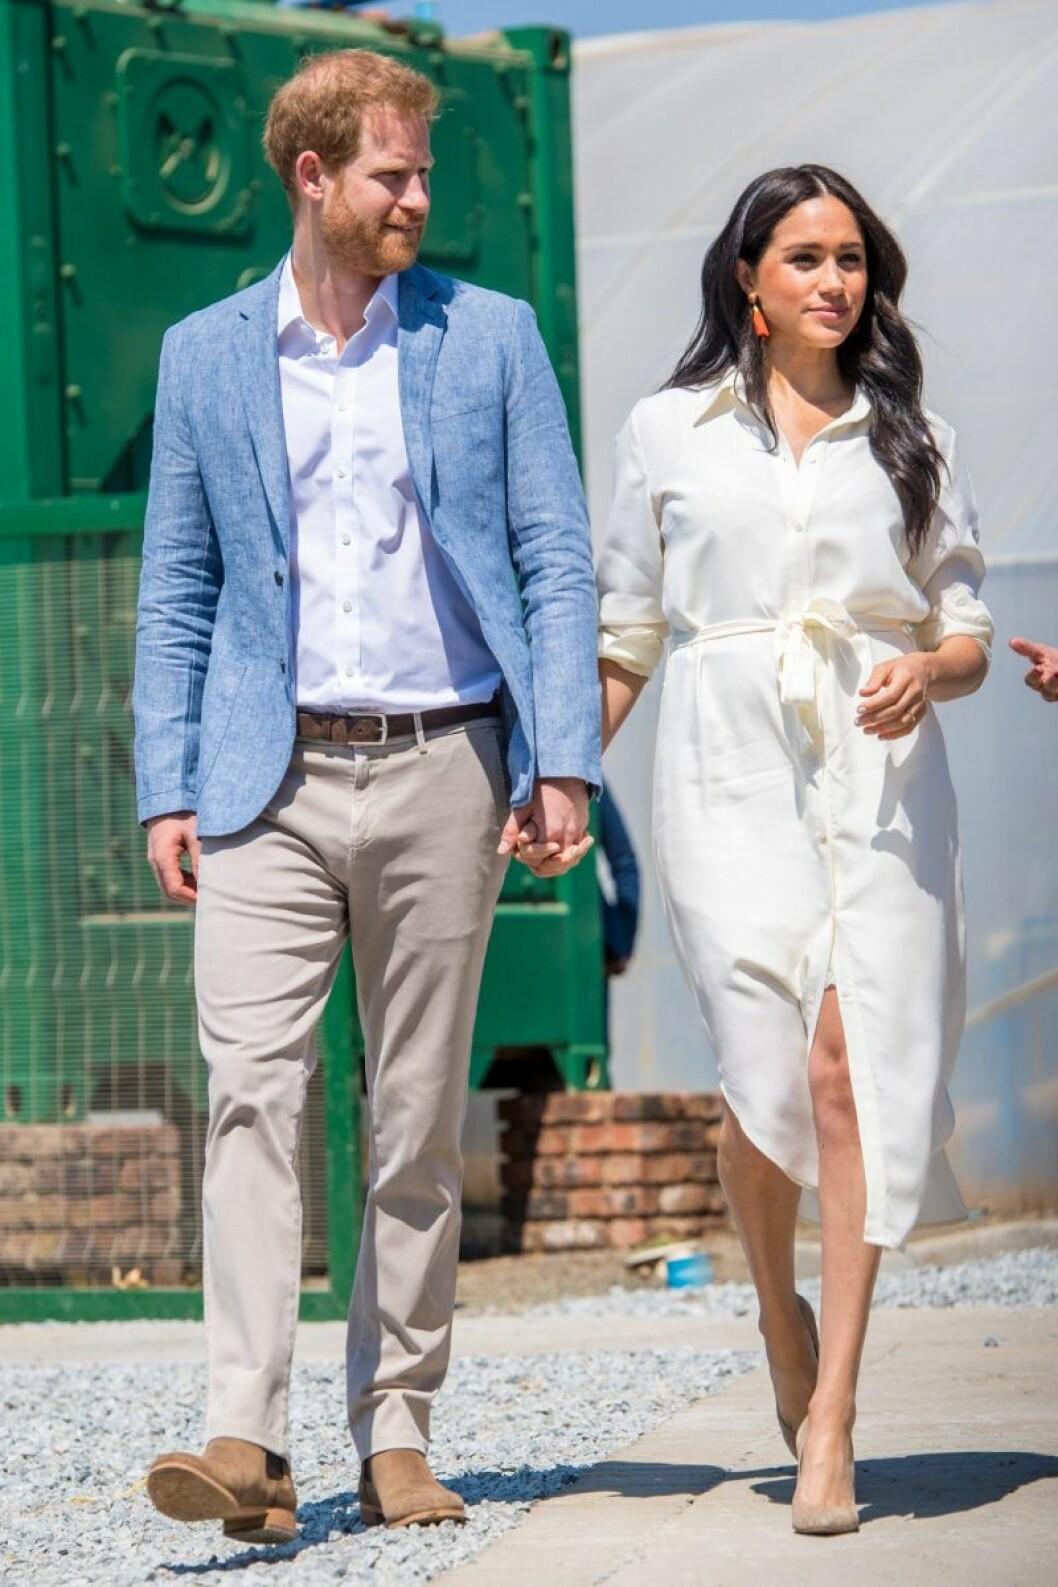 Prins Harry och Meghan Markle på resa ihop